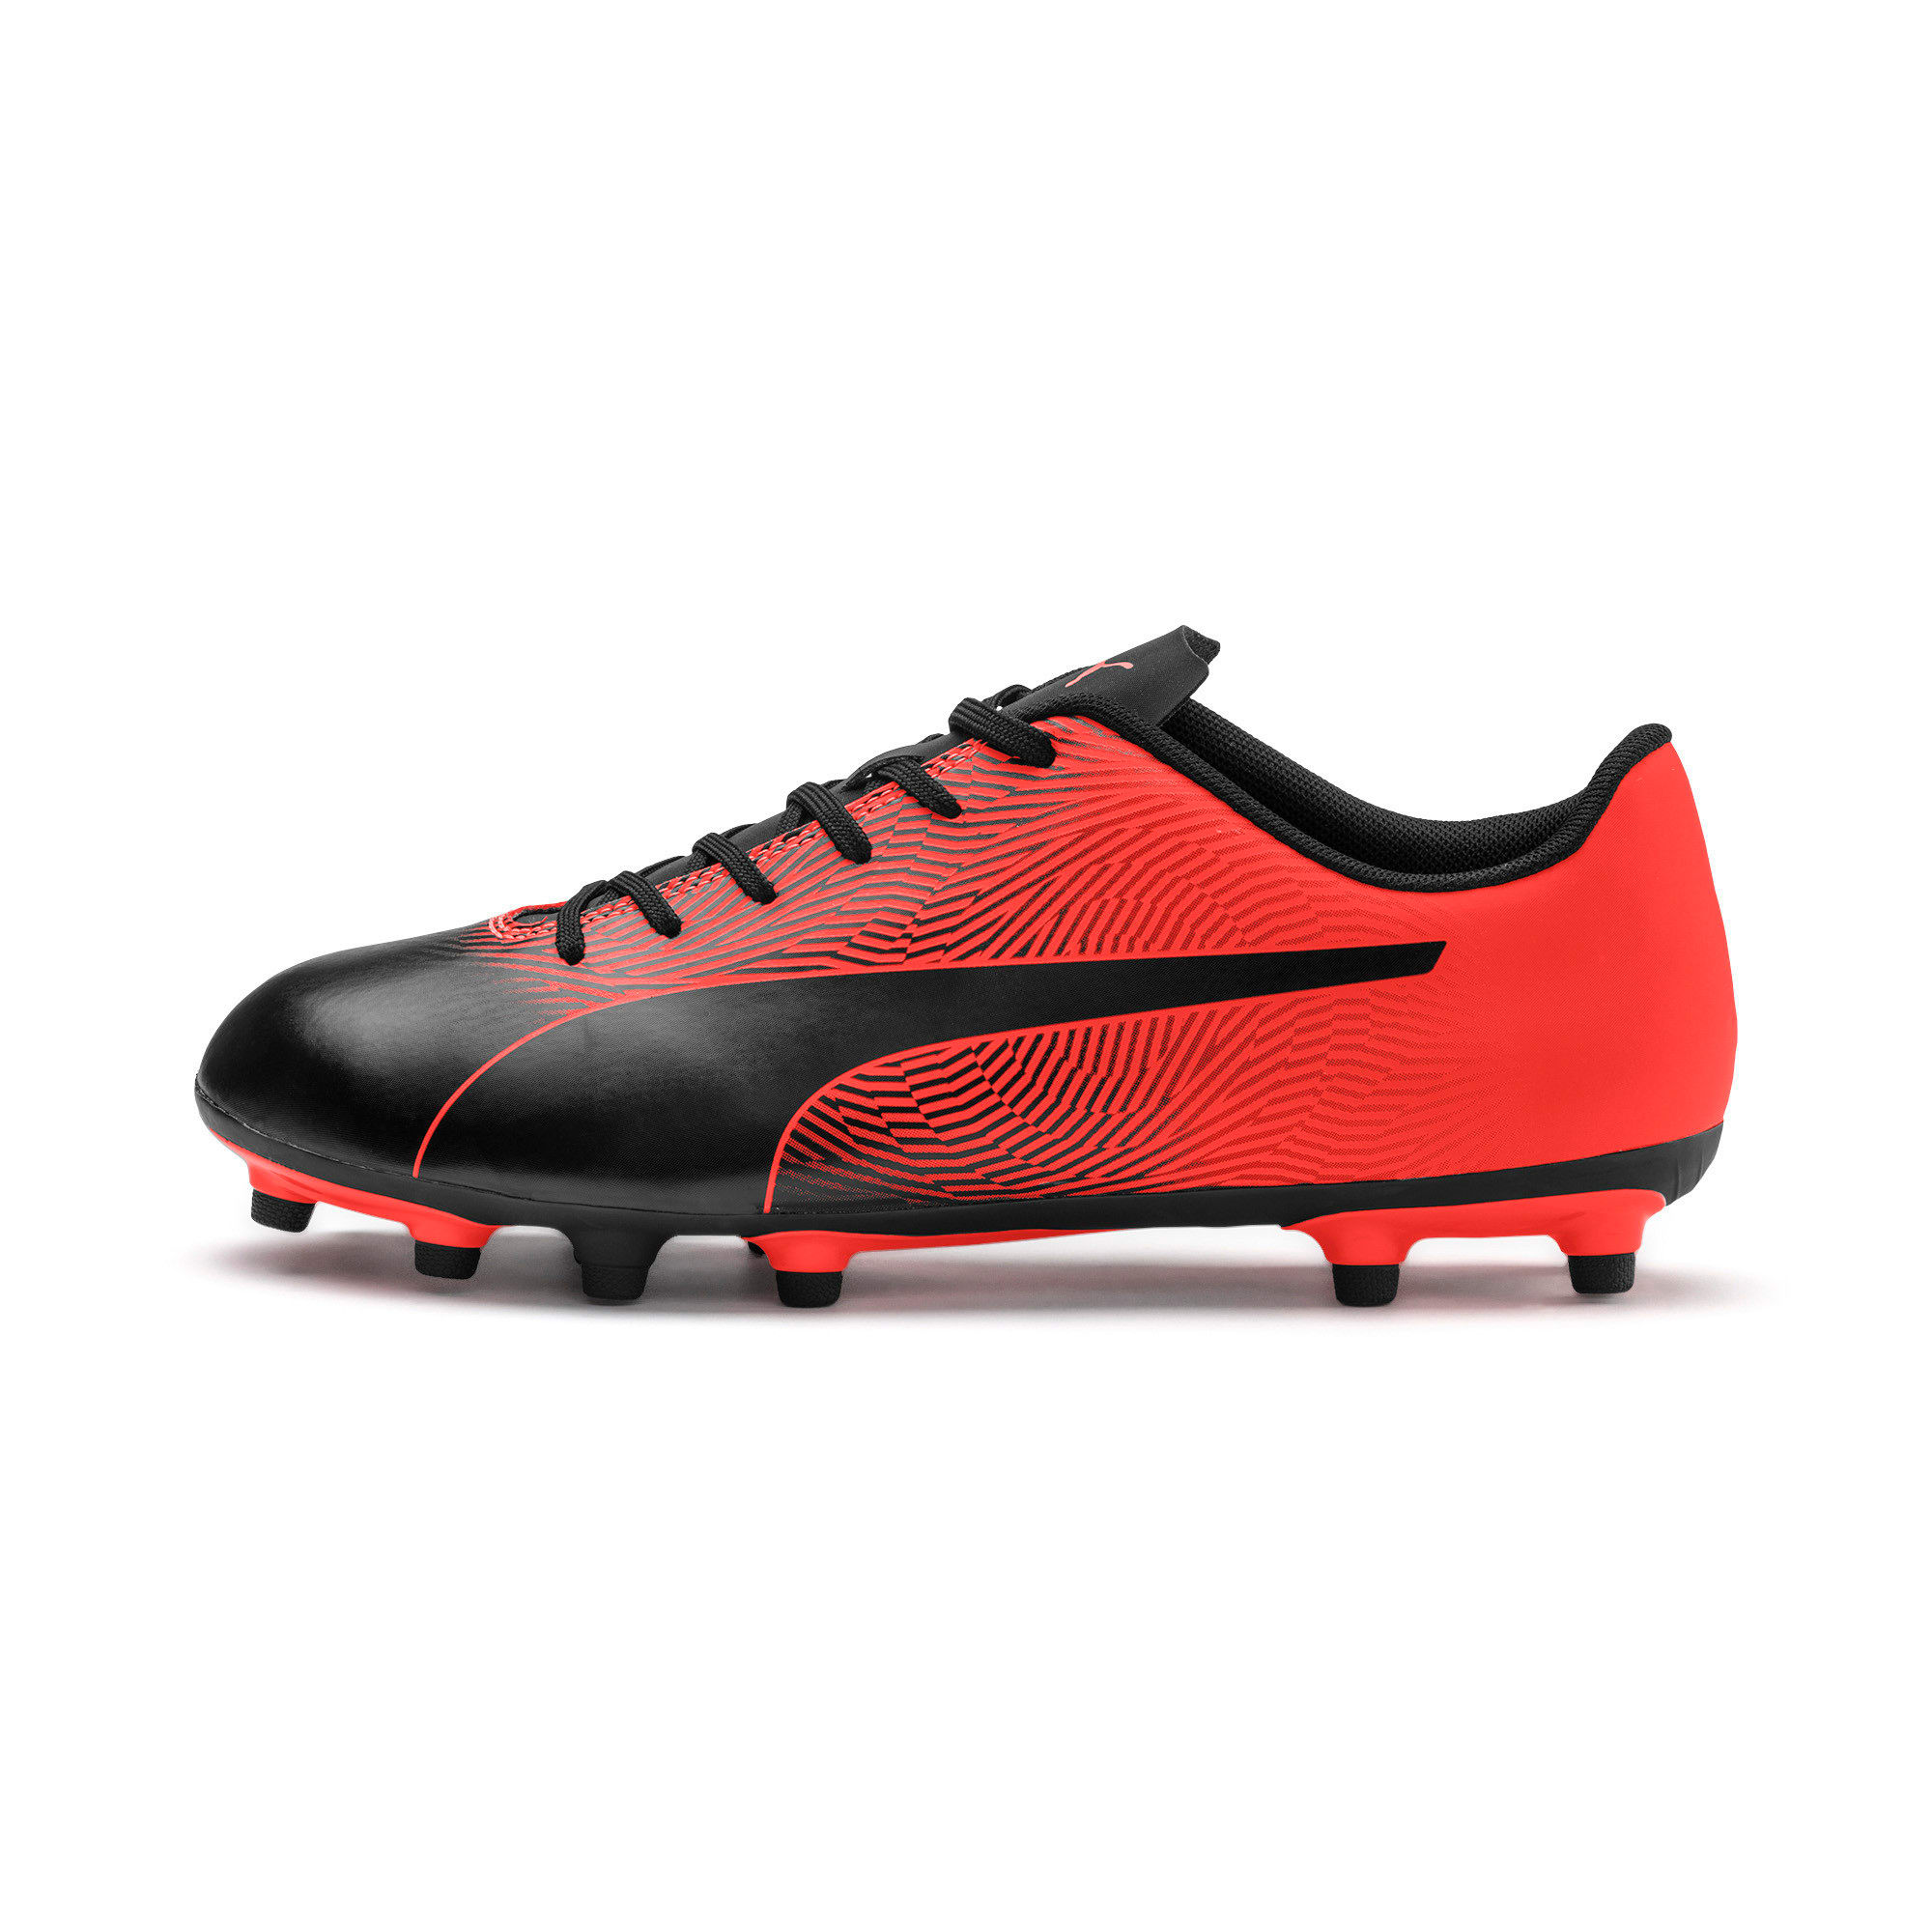 Thumbnail 1 of PUMA Spirit II FG Men's Football Boots, Puma Black-Nrgy Red, medium-IND